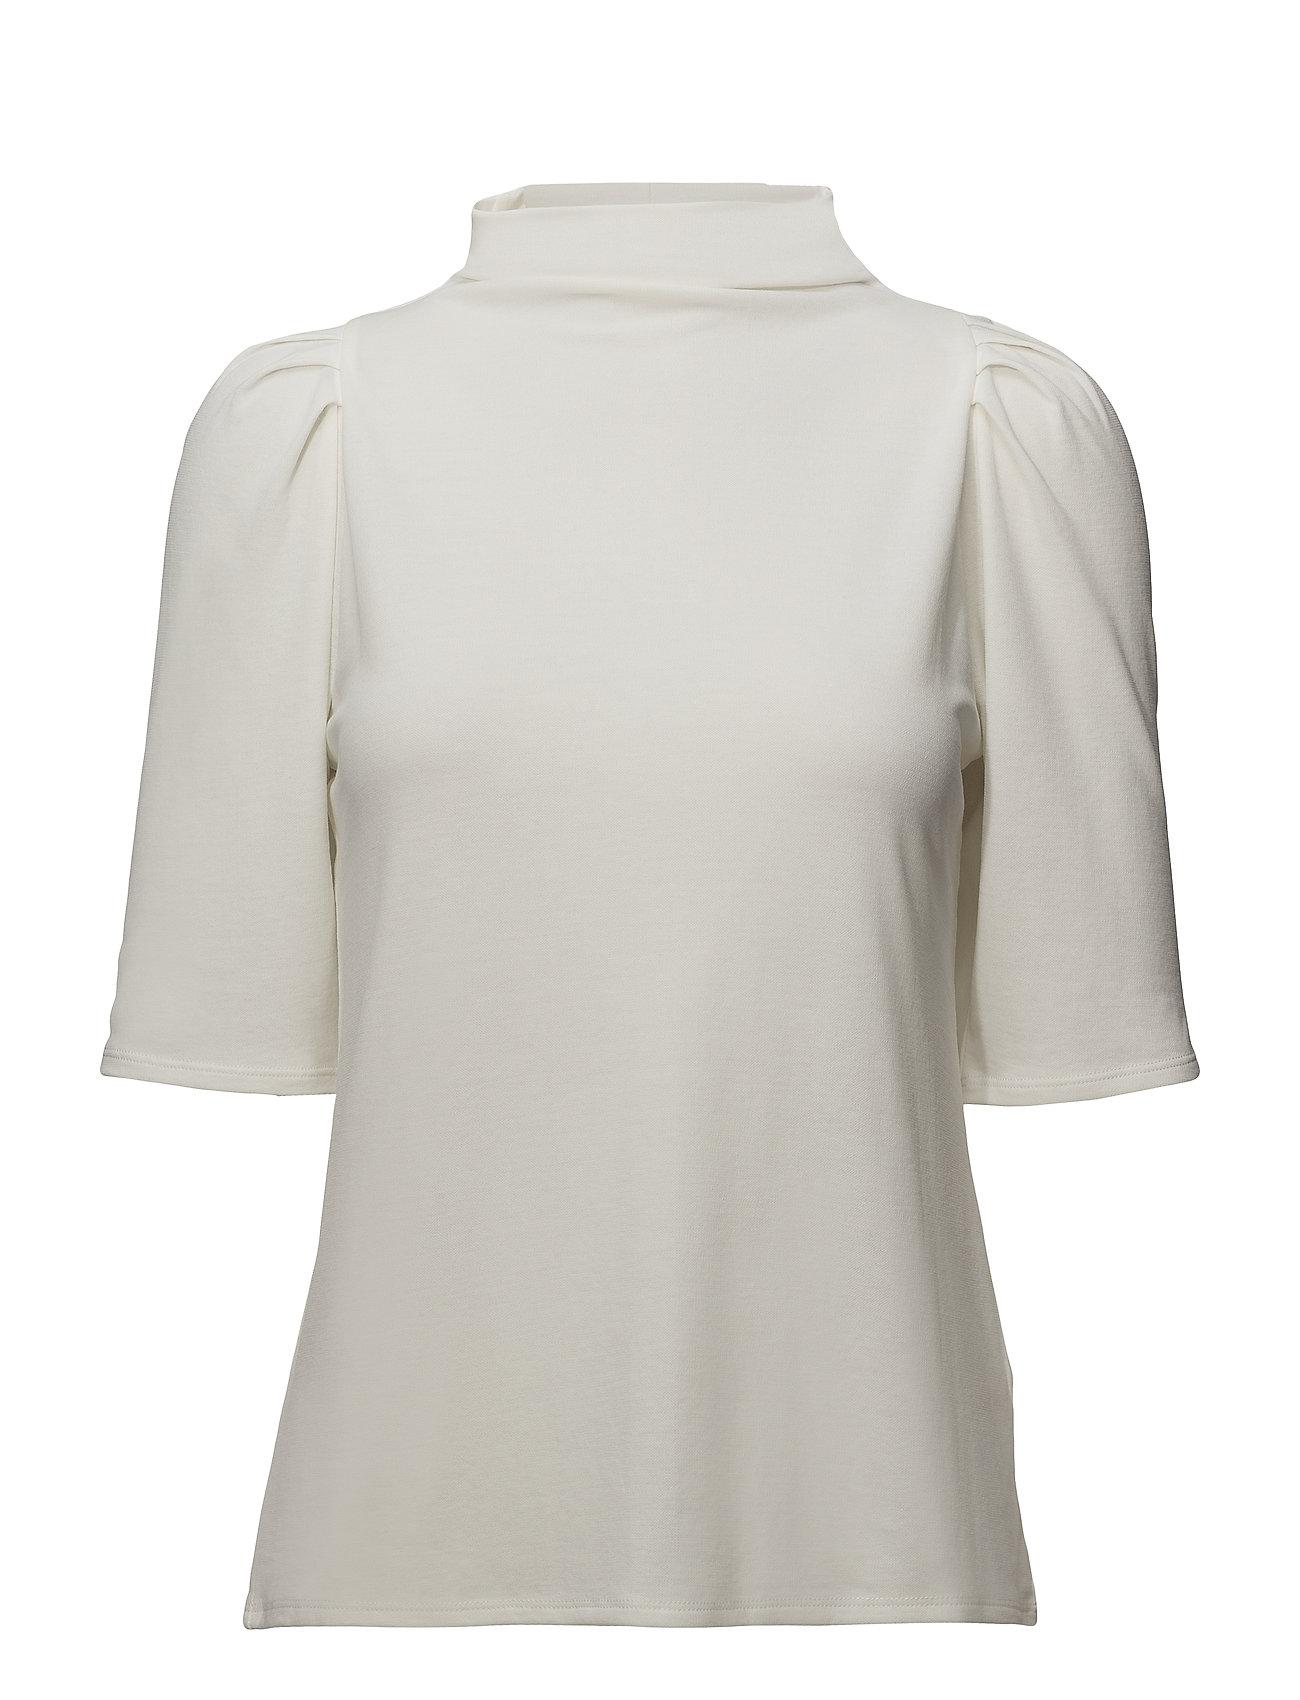 Filippa K Cotton Crepe Pleat Top